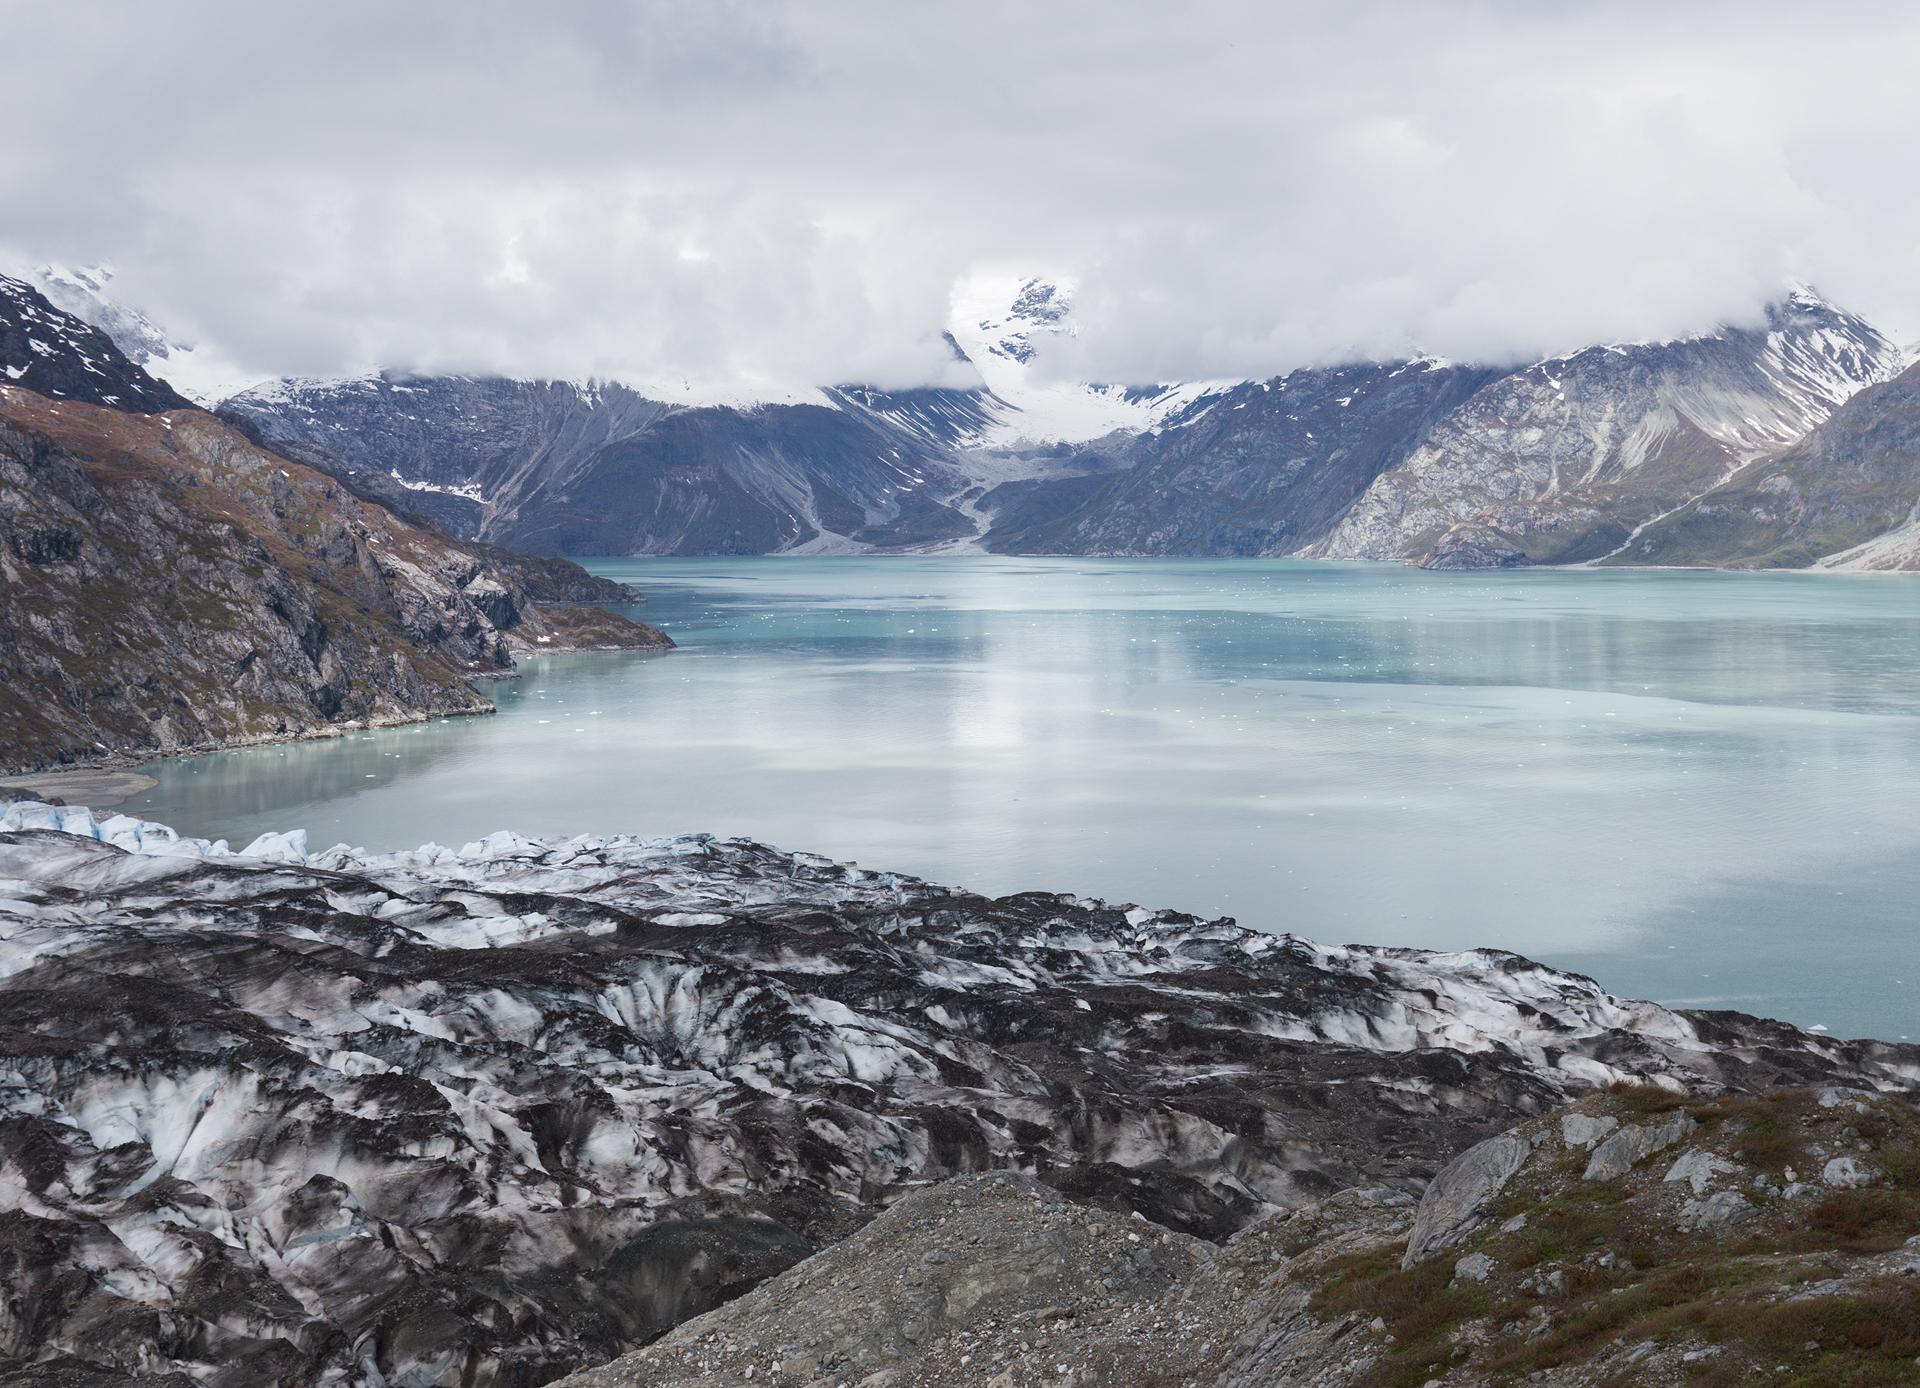 Glacier Bay National Park West Arm Kayaking Camping Trip-39.jpg